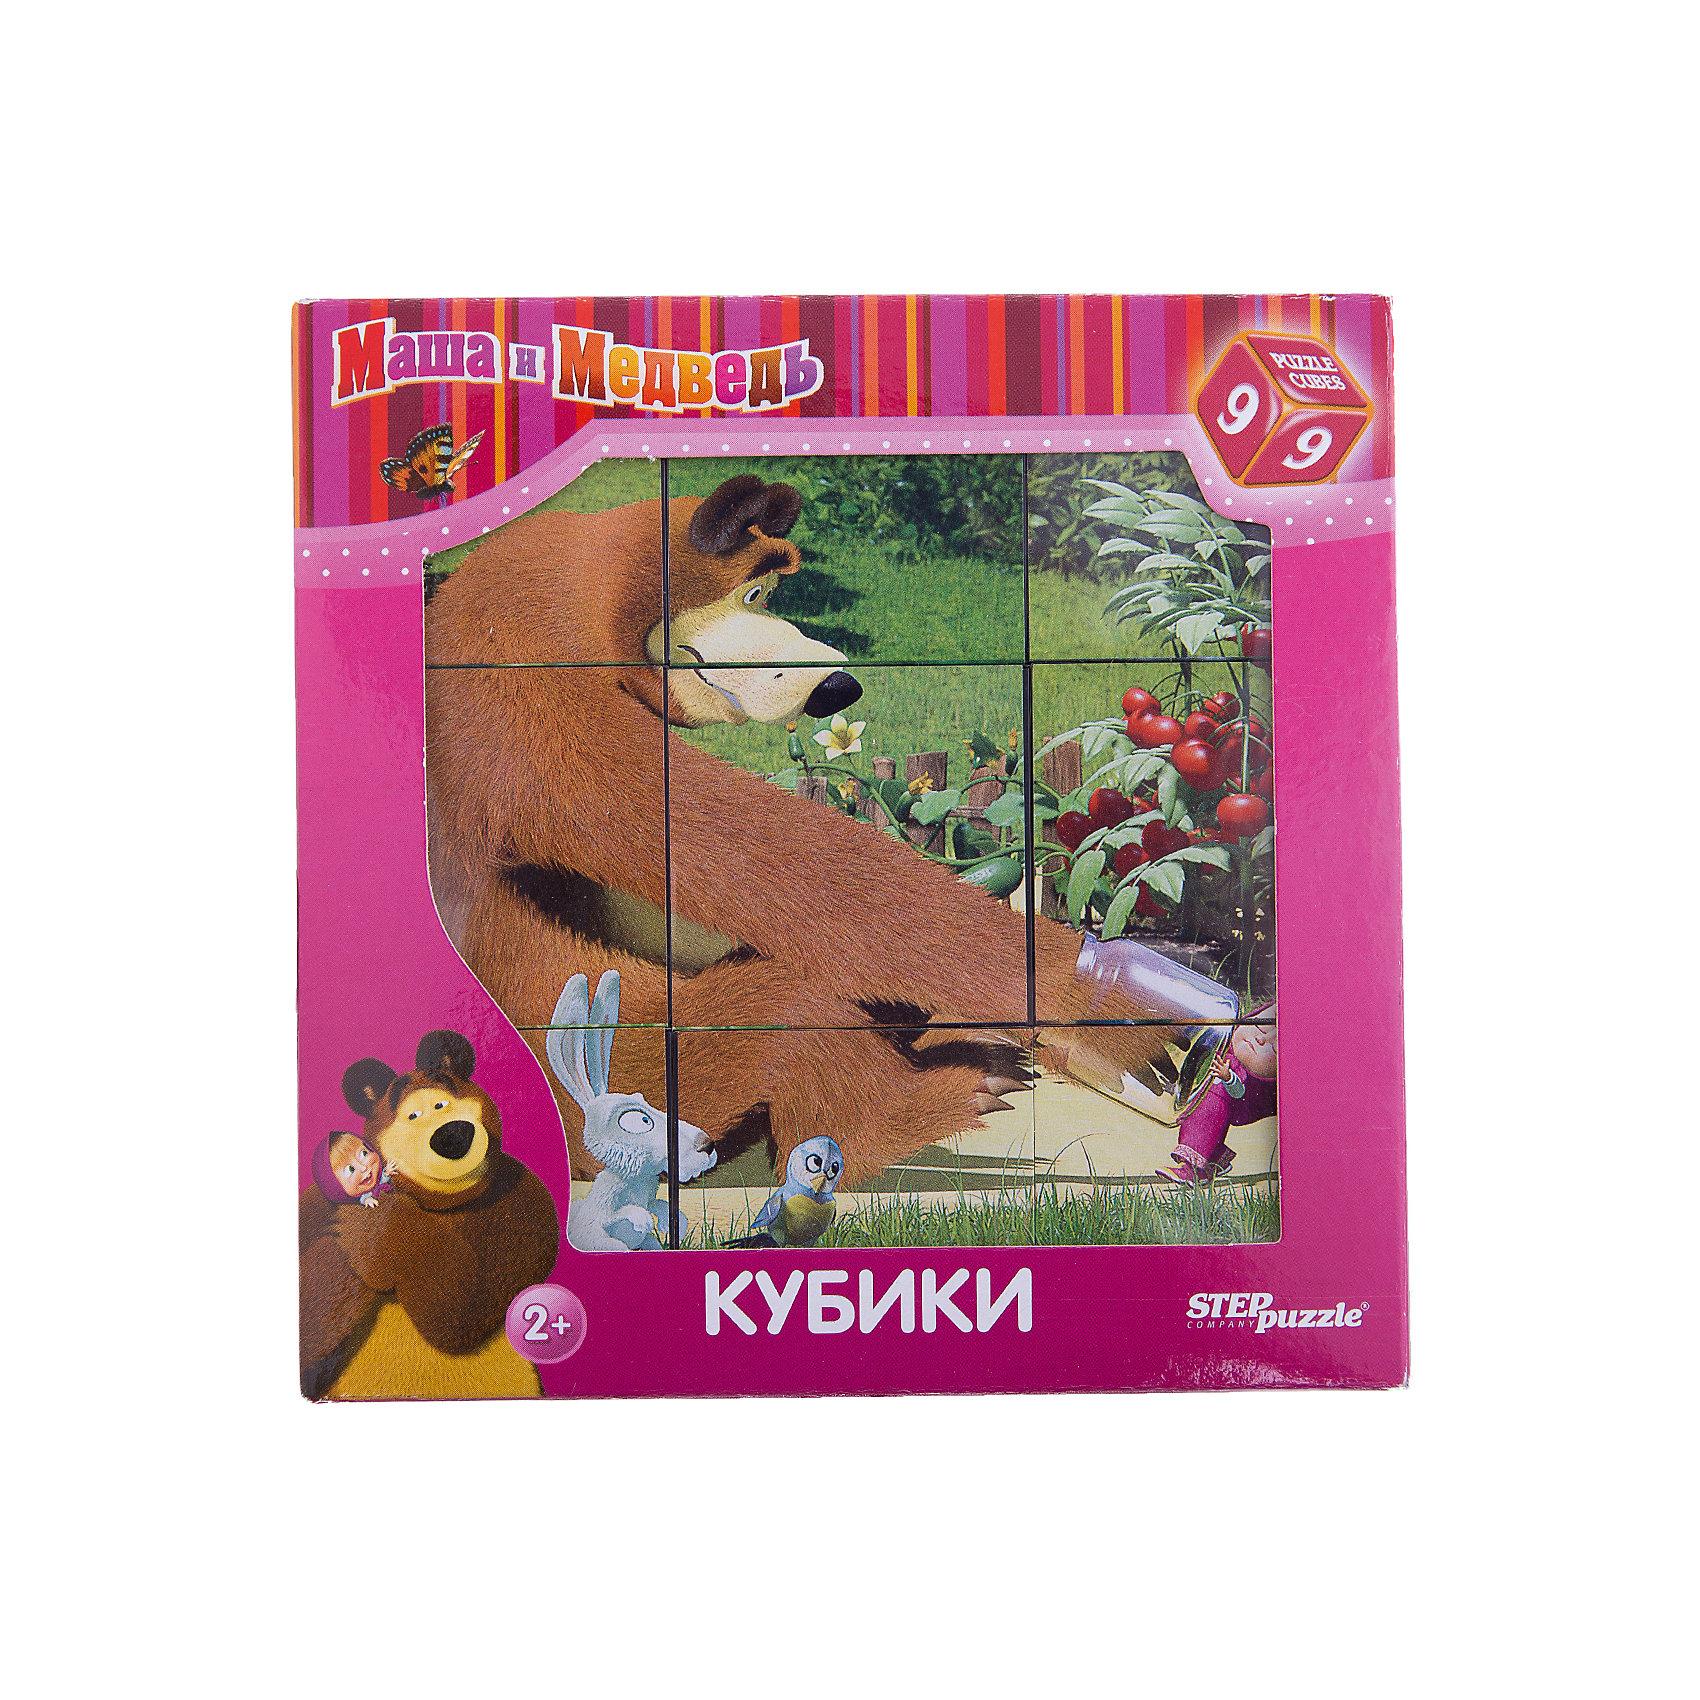 Степ Пазл Кубики Маша и Медведь, 9 шт., Step puzzle